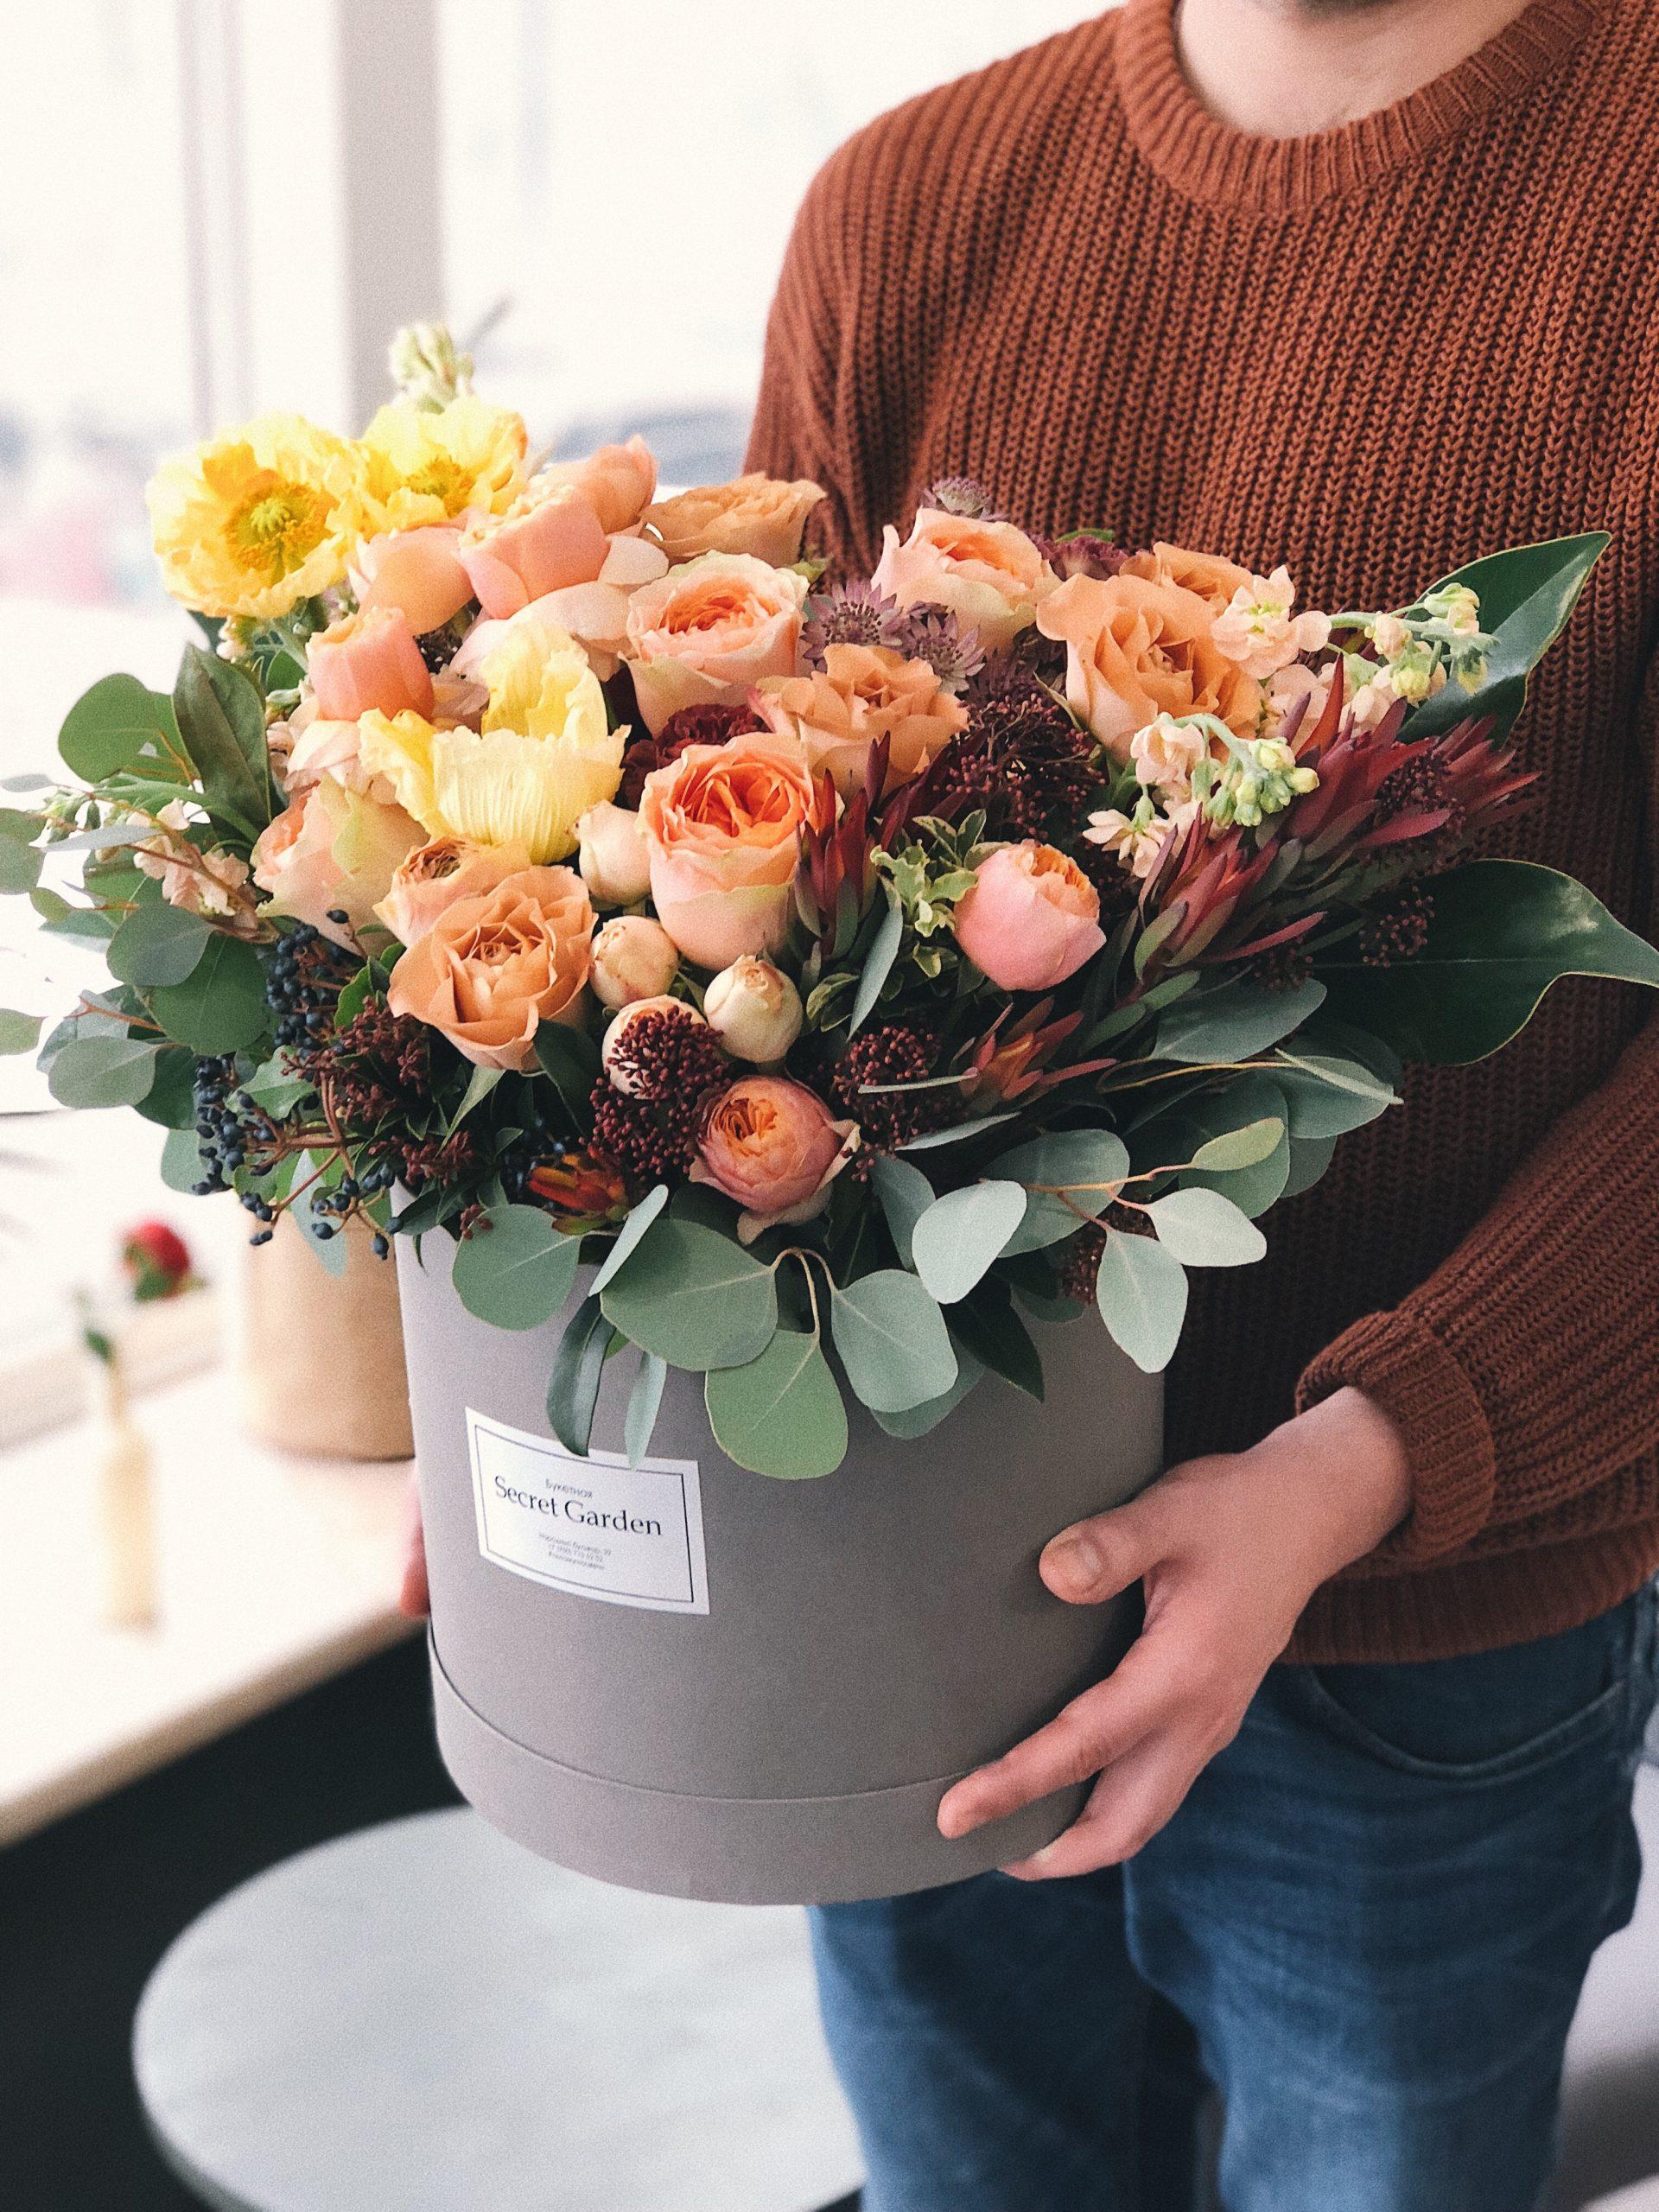 amazing gifts women image